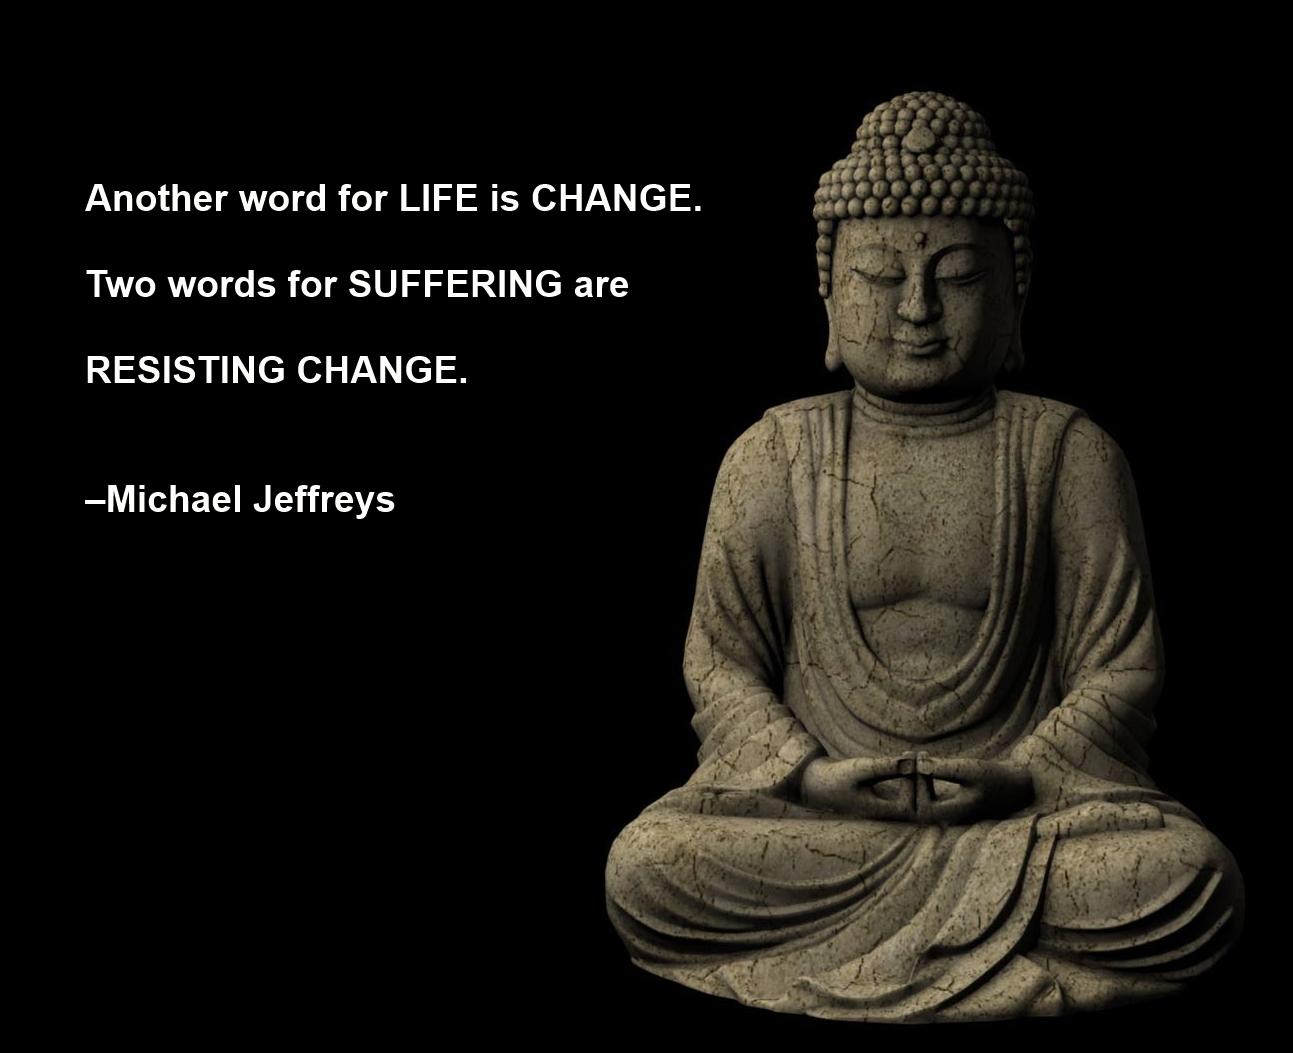 Anotherwordforchange